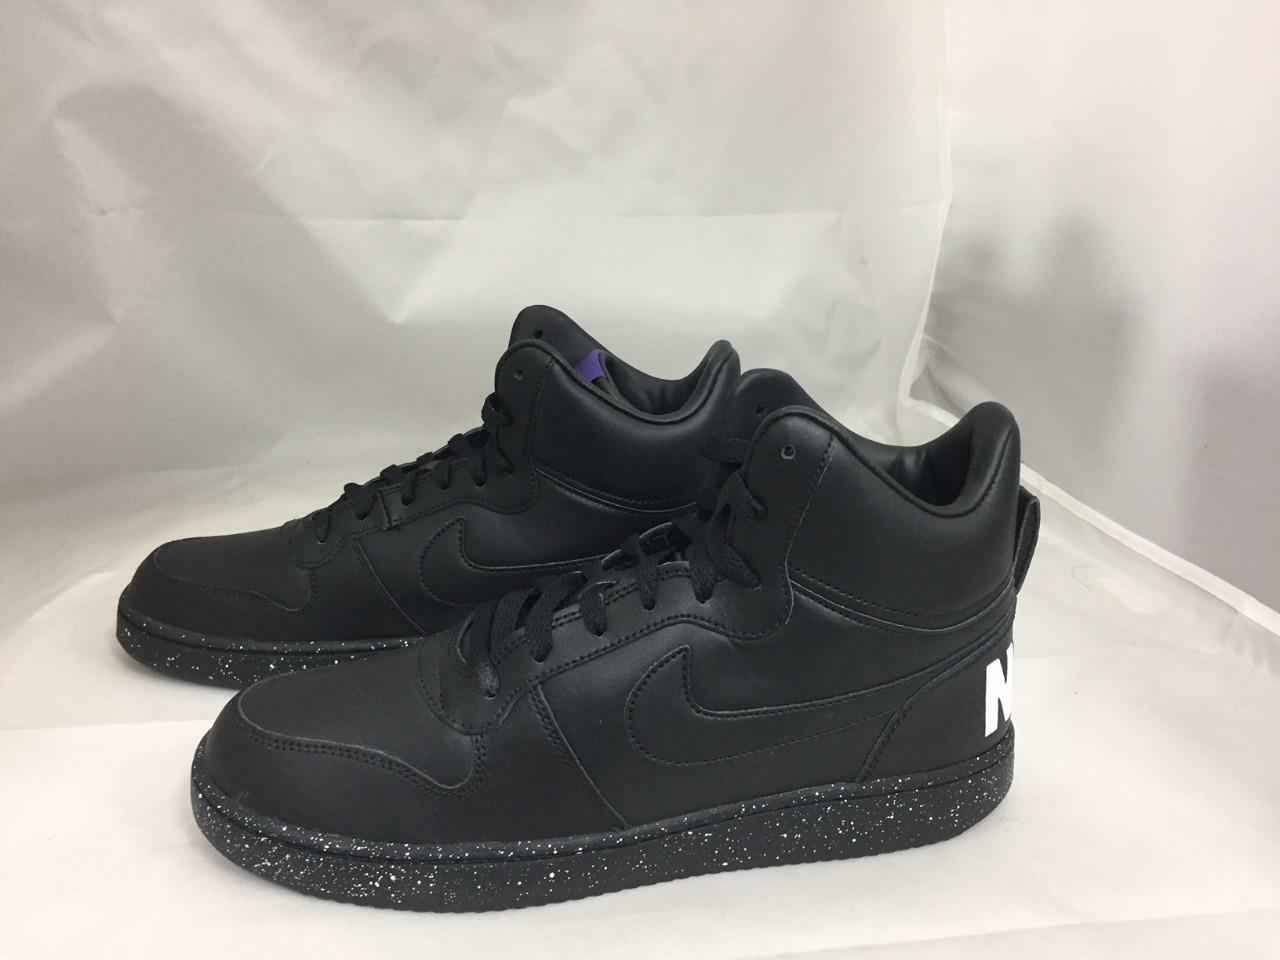 Nuevo Hombre Para Hombre Nuevo Nike Court Borough a mediados de 916759-001 428b2c